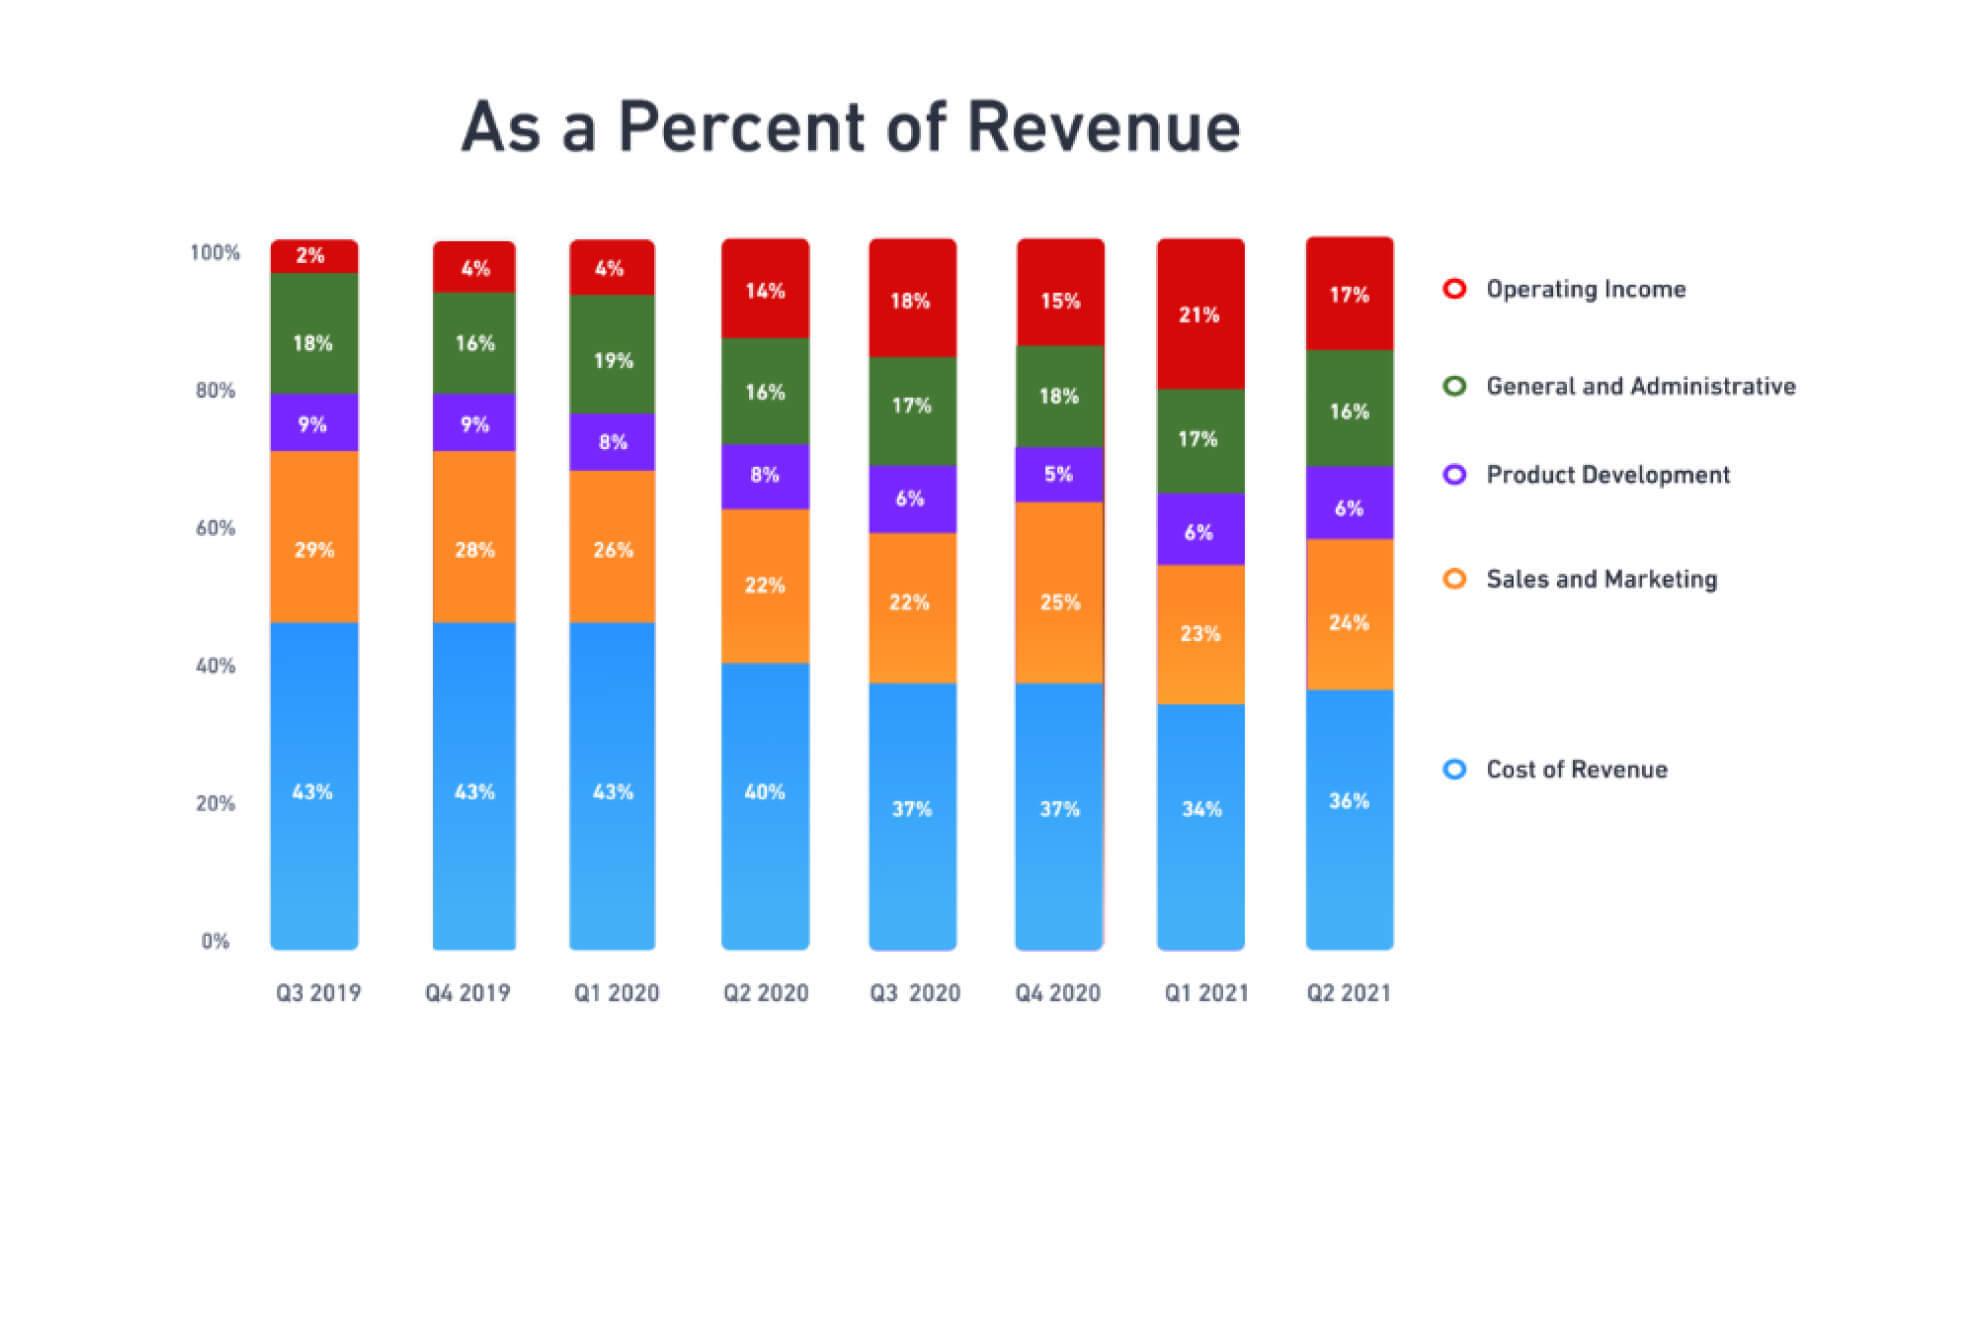 As a Percent of Revenue